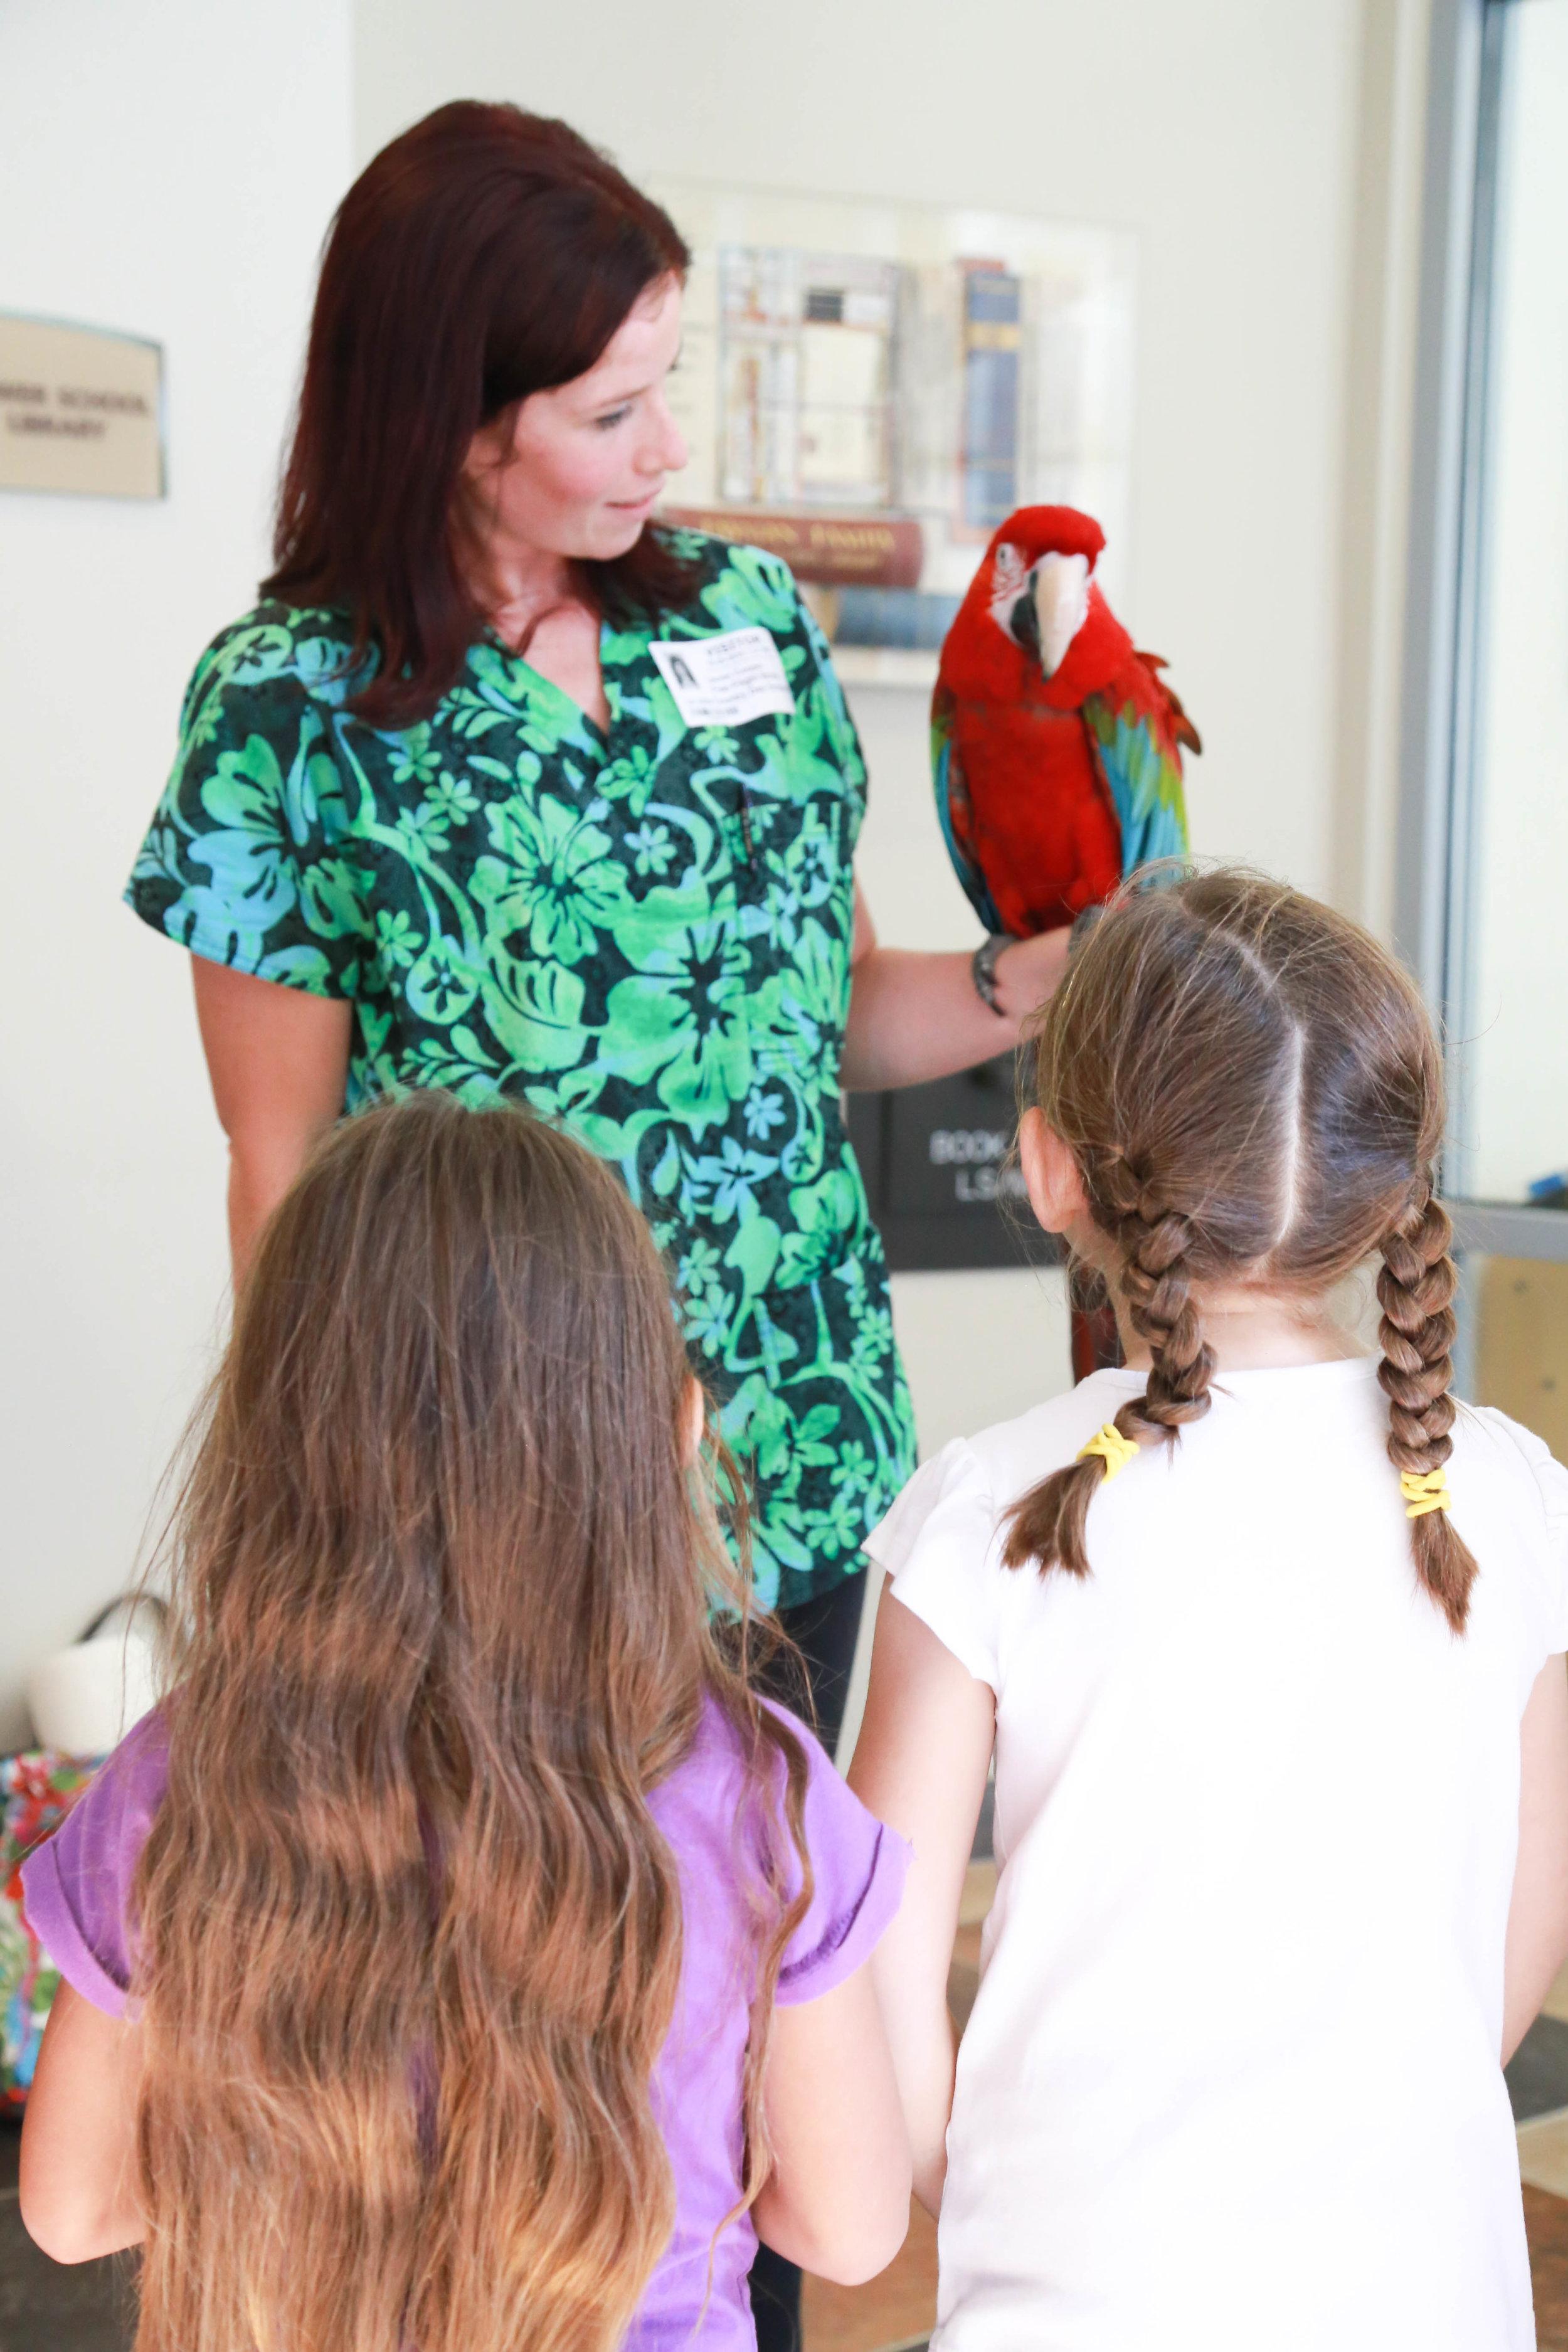 Students learn about what makes a parrot so unique [Photo: Rachel Baxter, LJCDS]